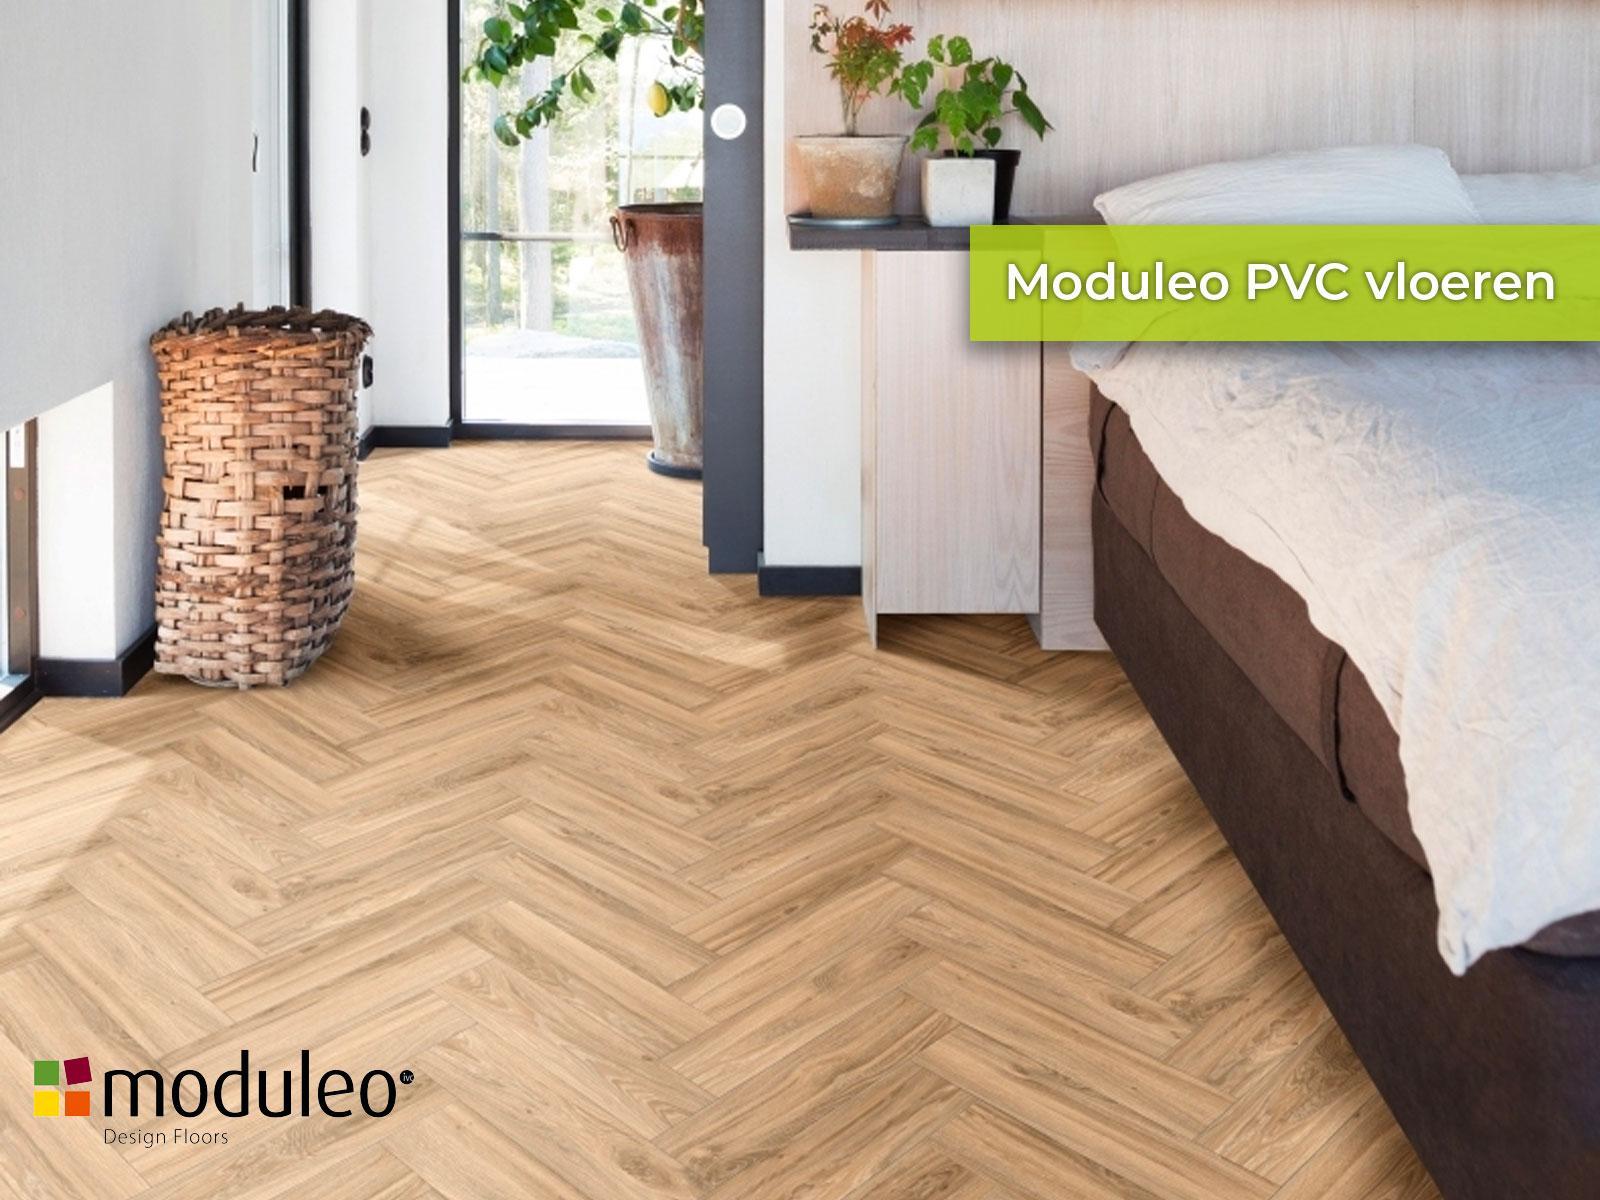 Moduleo PVC vloer